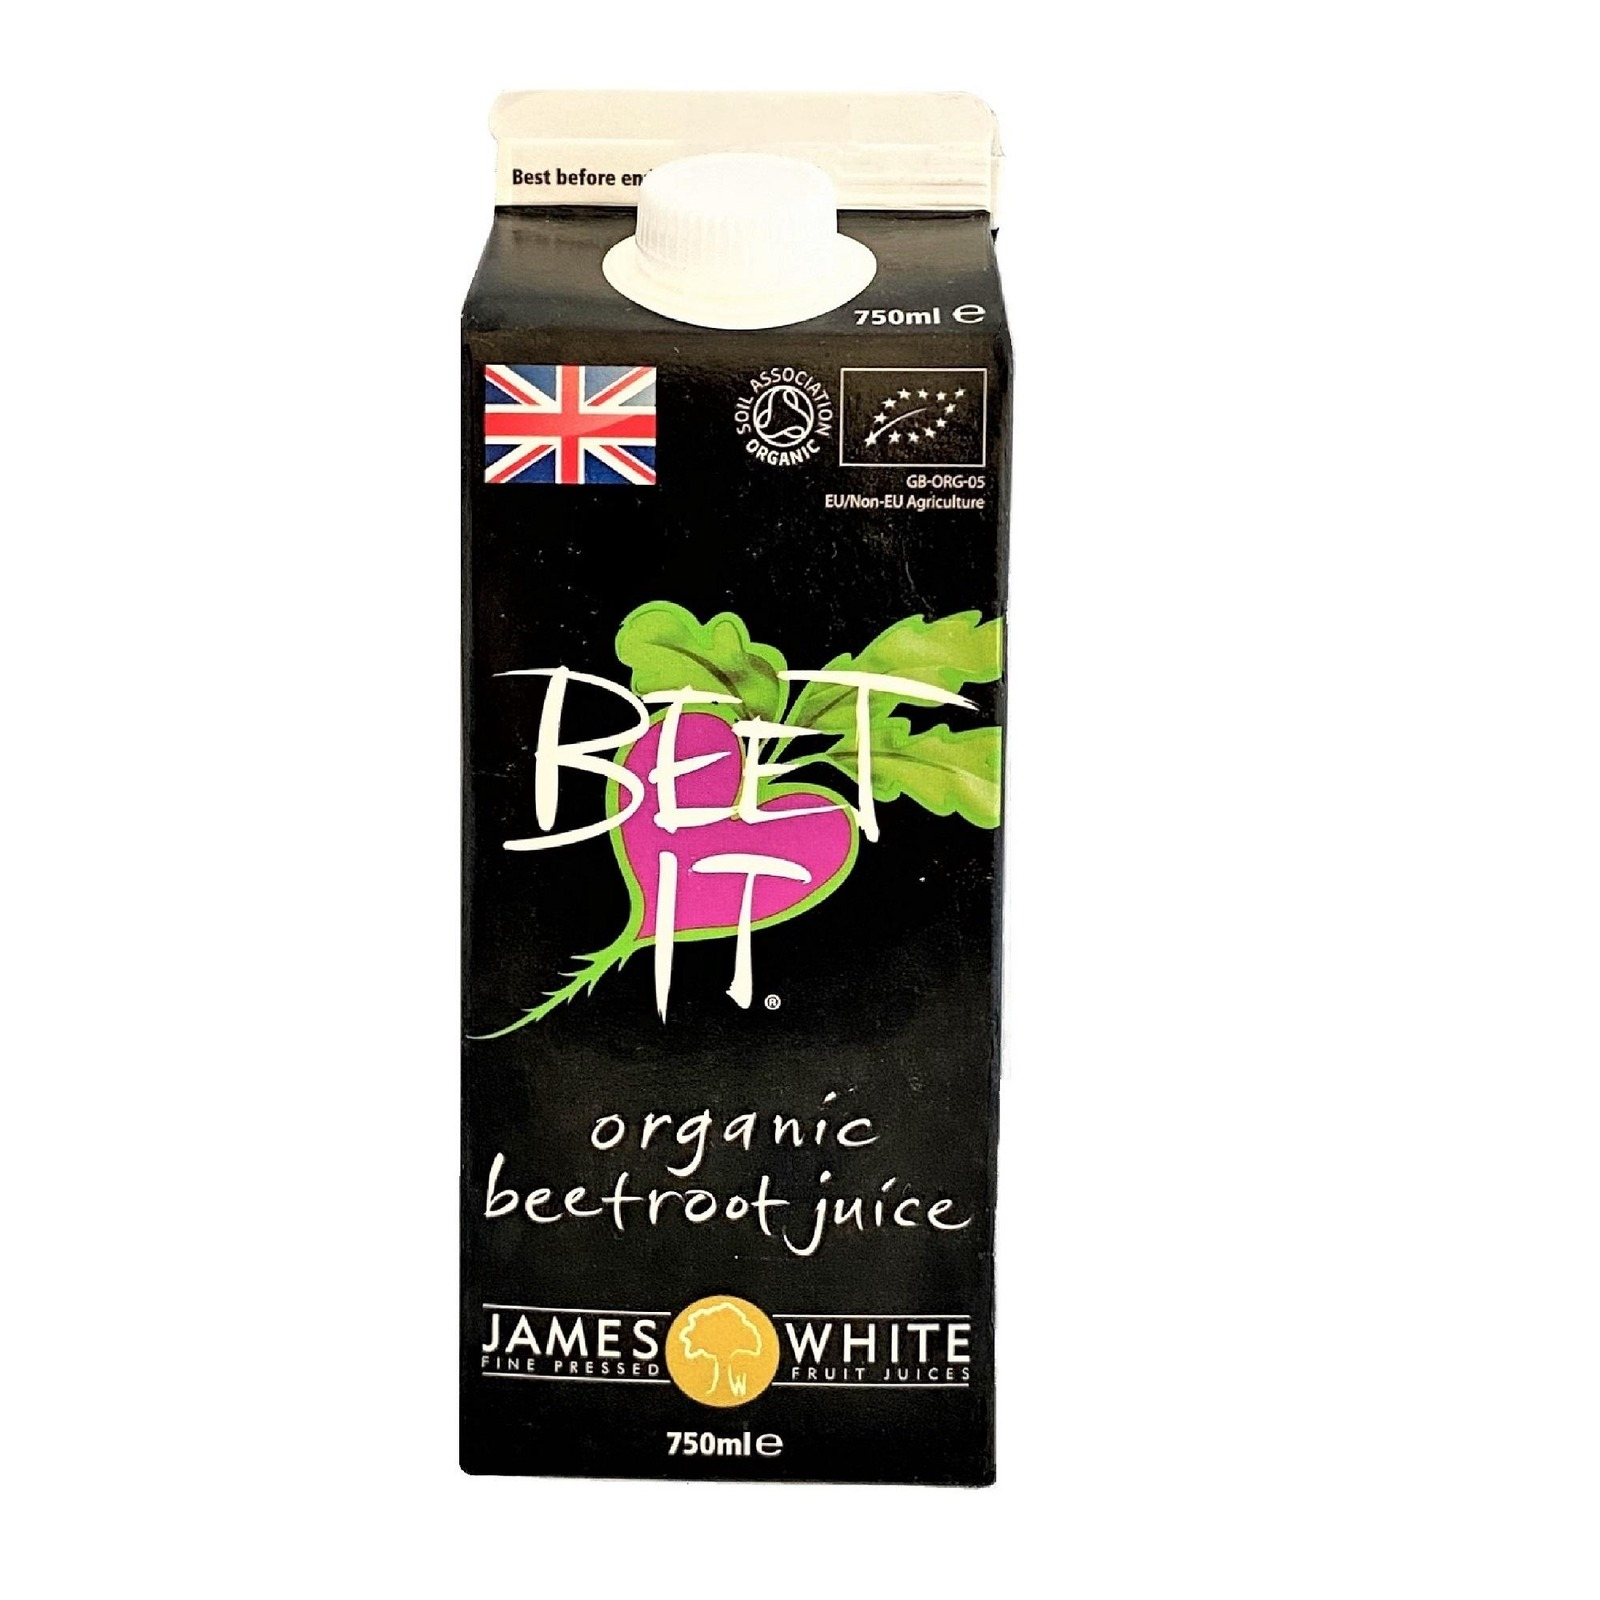 JAMES WHITE Beets IT Organic Beetroot Juice (Tetra)